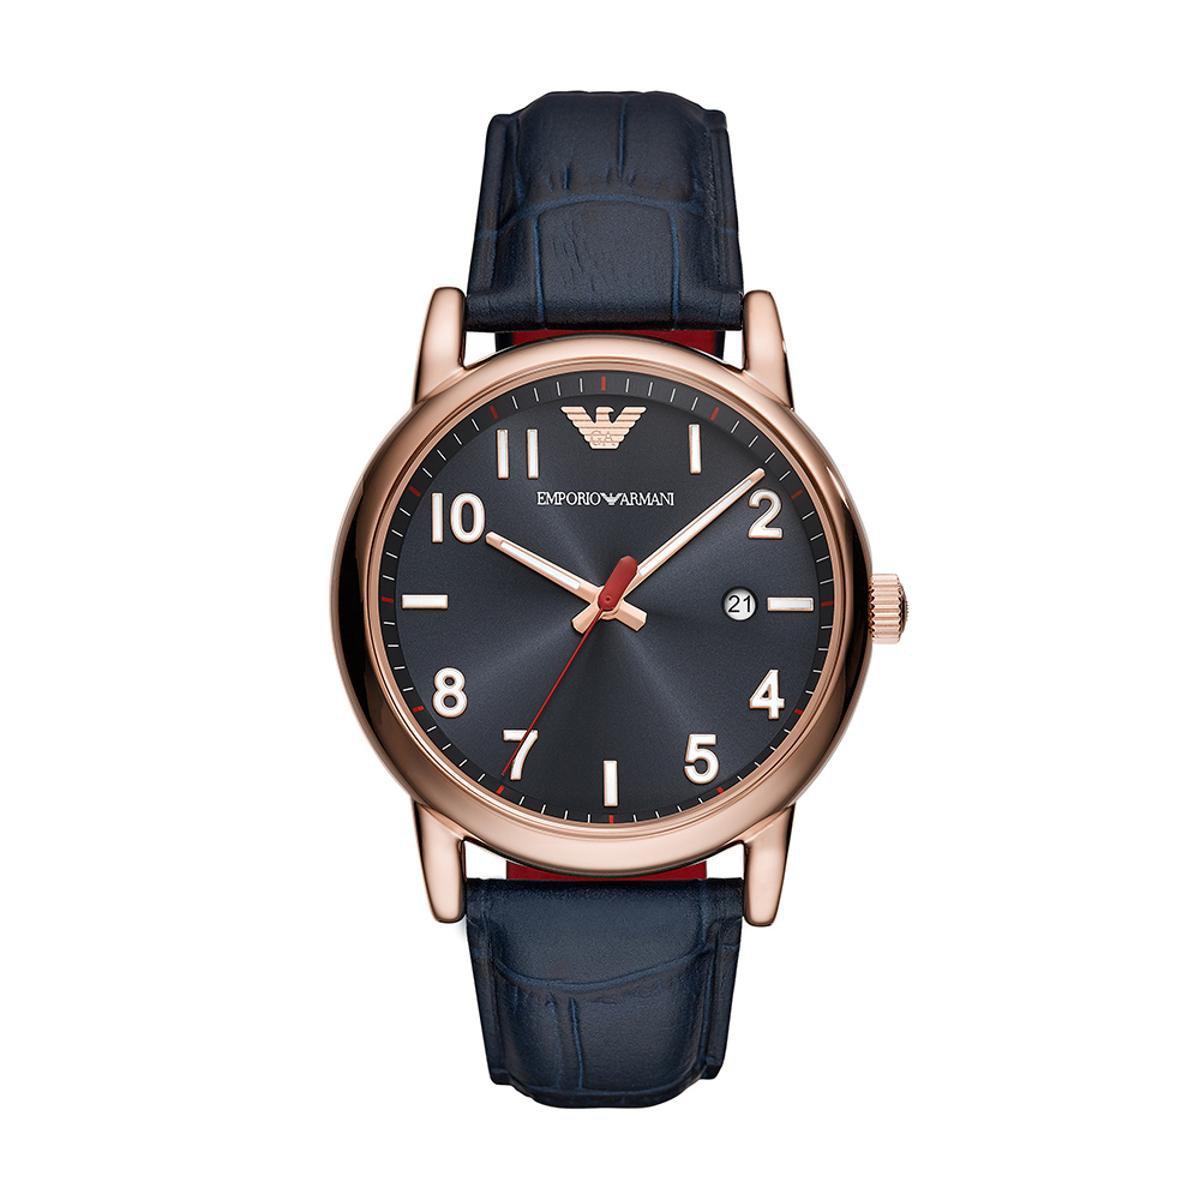 464dfd8c466 Relógio Empório Armani Masculino Luigi - AR11135 0AN AR11135 0AN - Azul